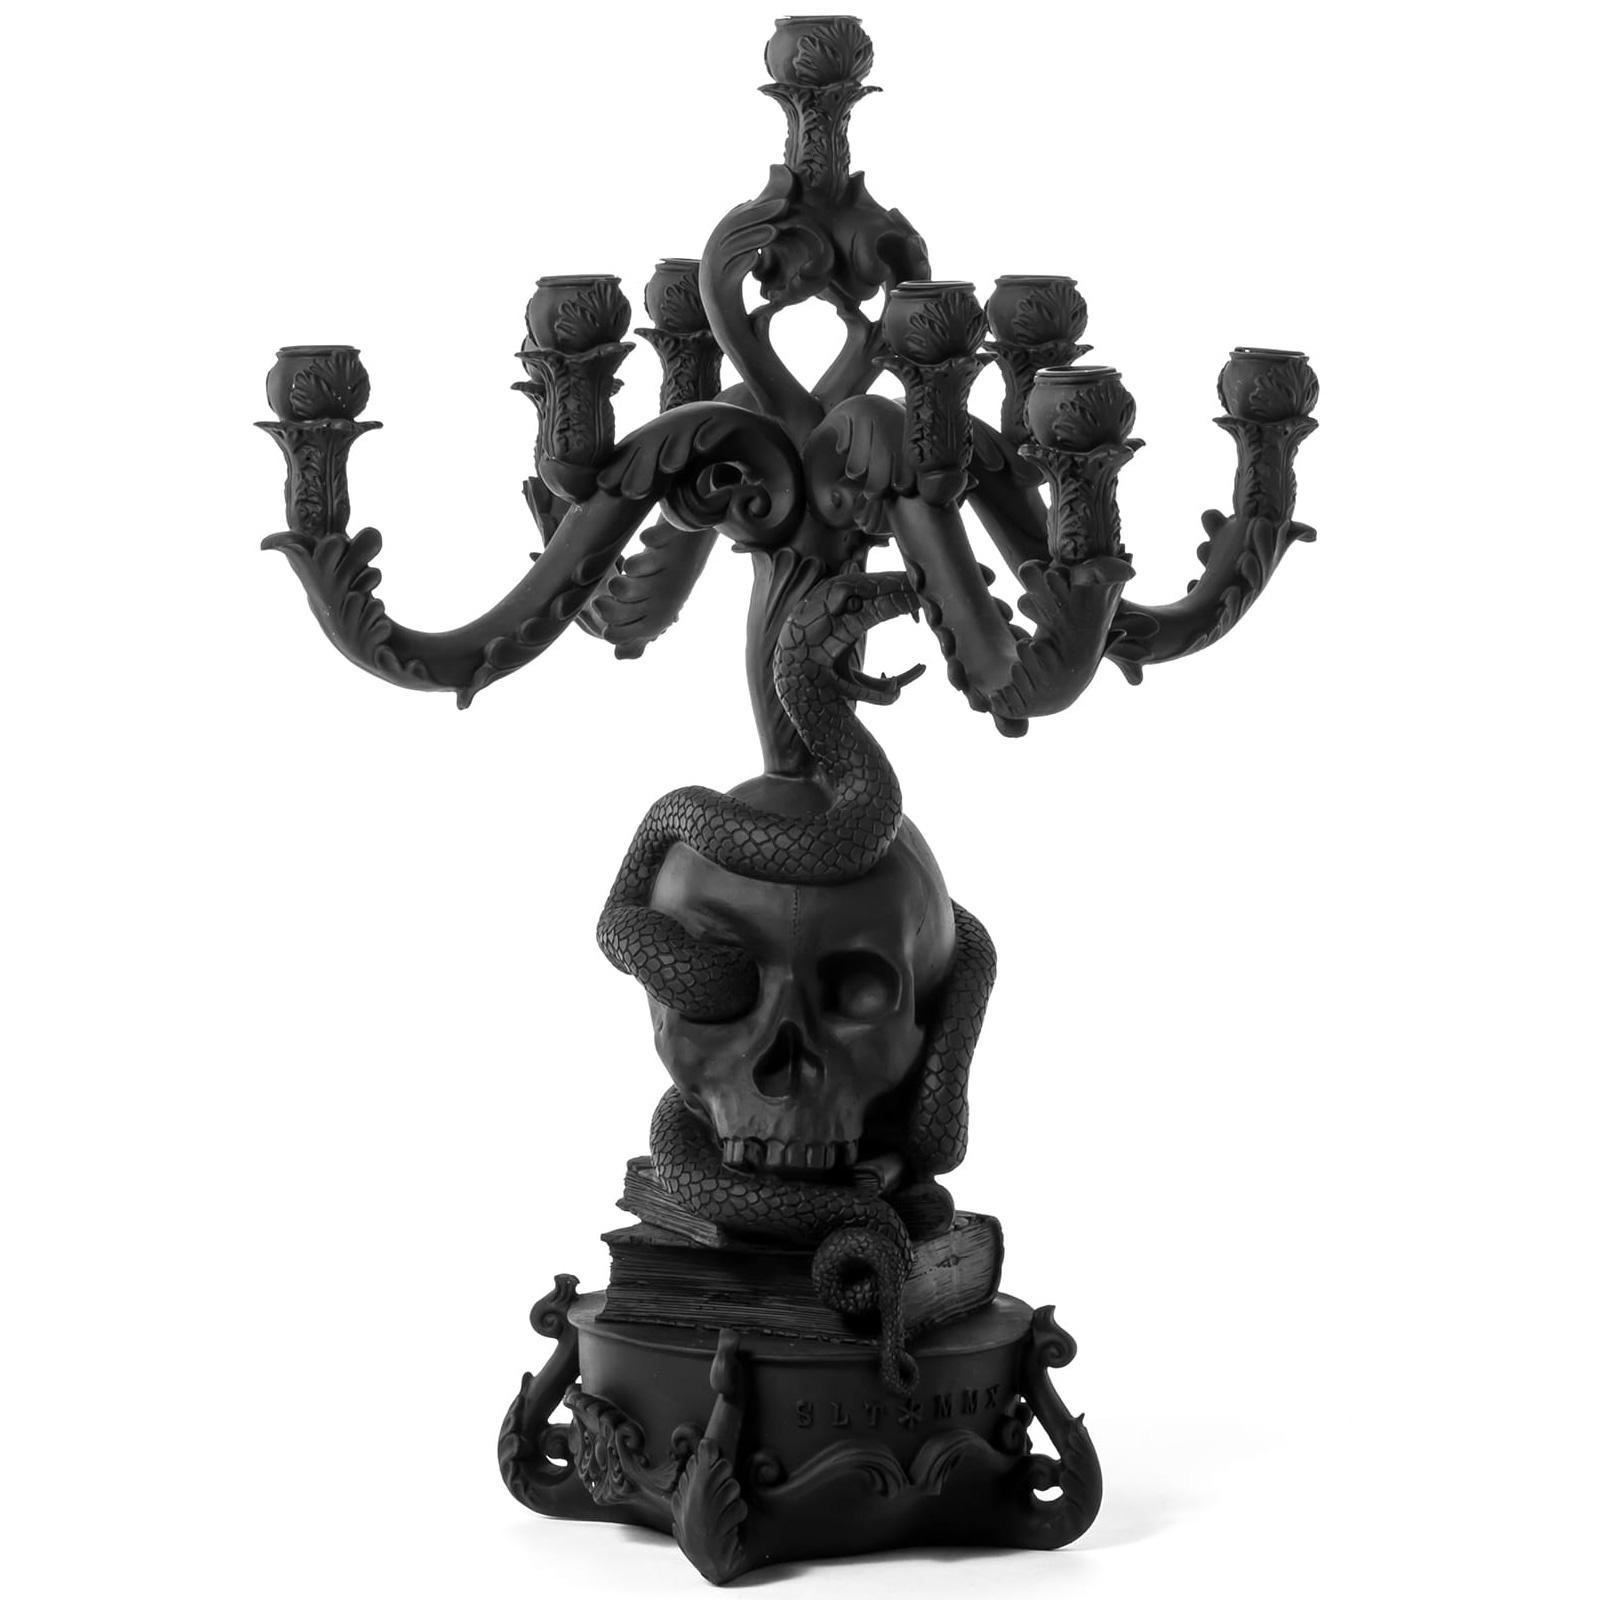 Giant Burlesque Skull Candle Holder By Seletti Sel 14873 Ner